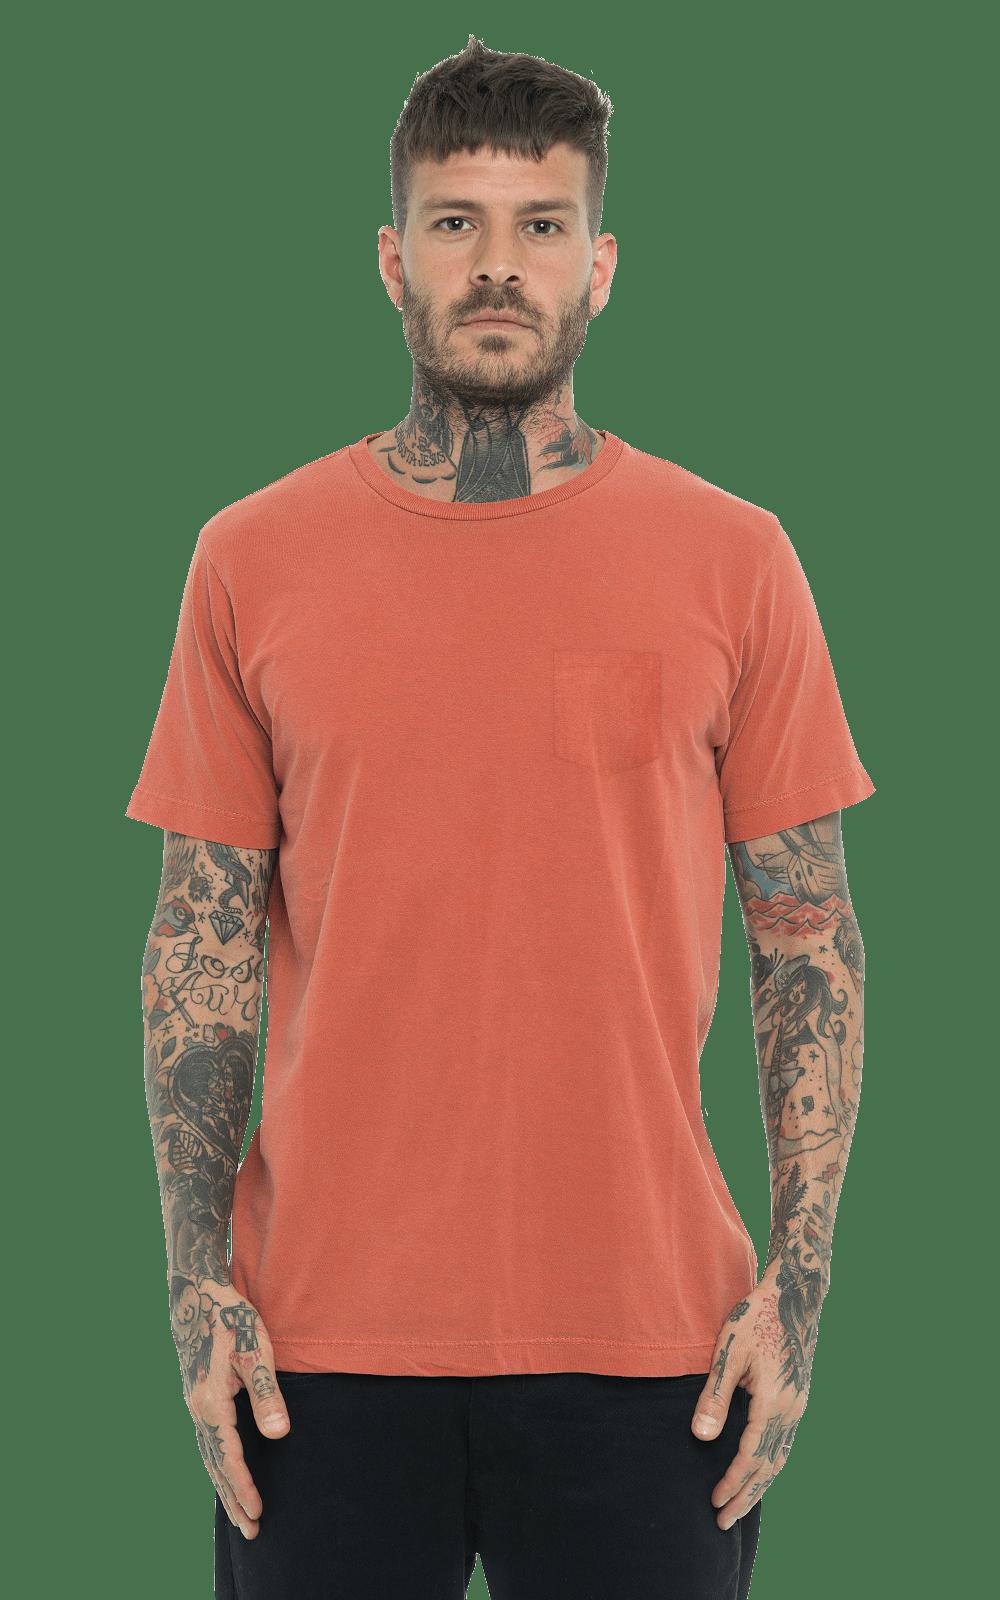 Camiseta_TinturadaBolso_Orange_Frente